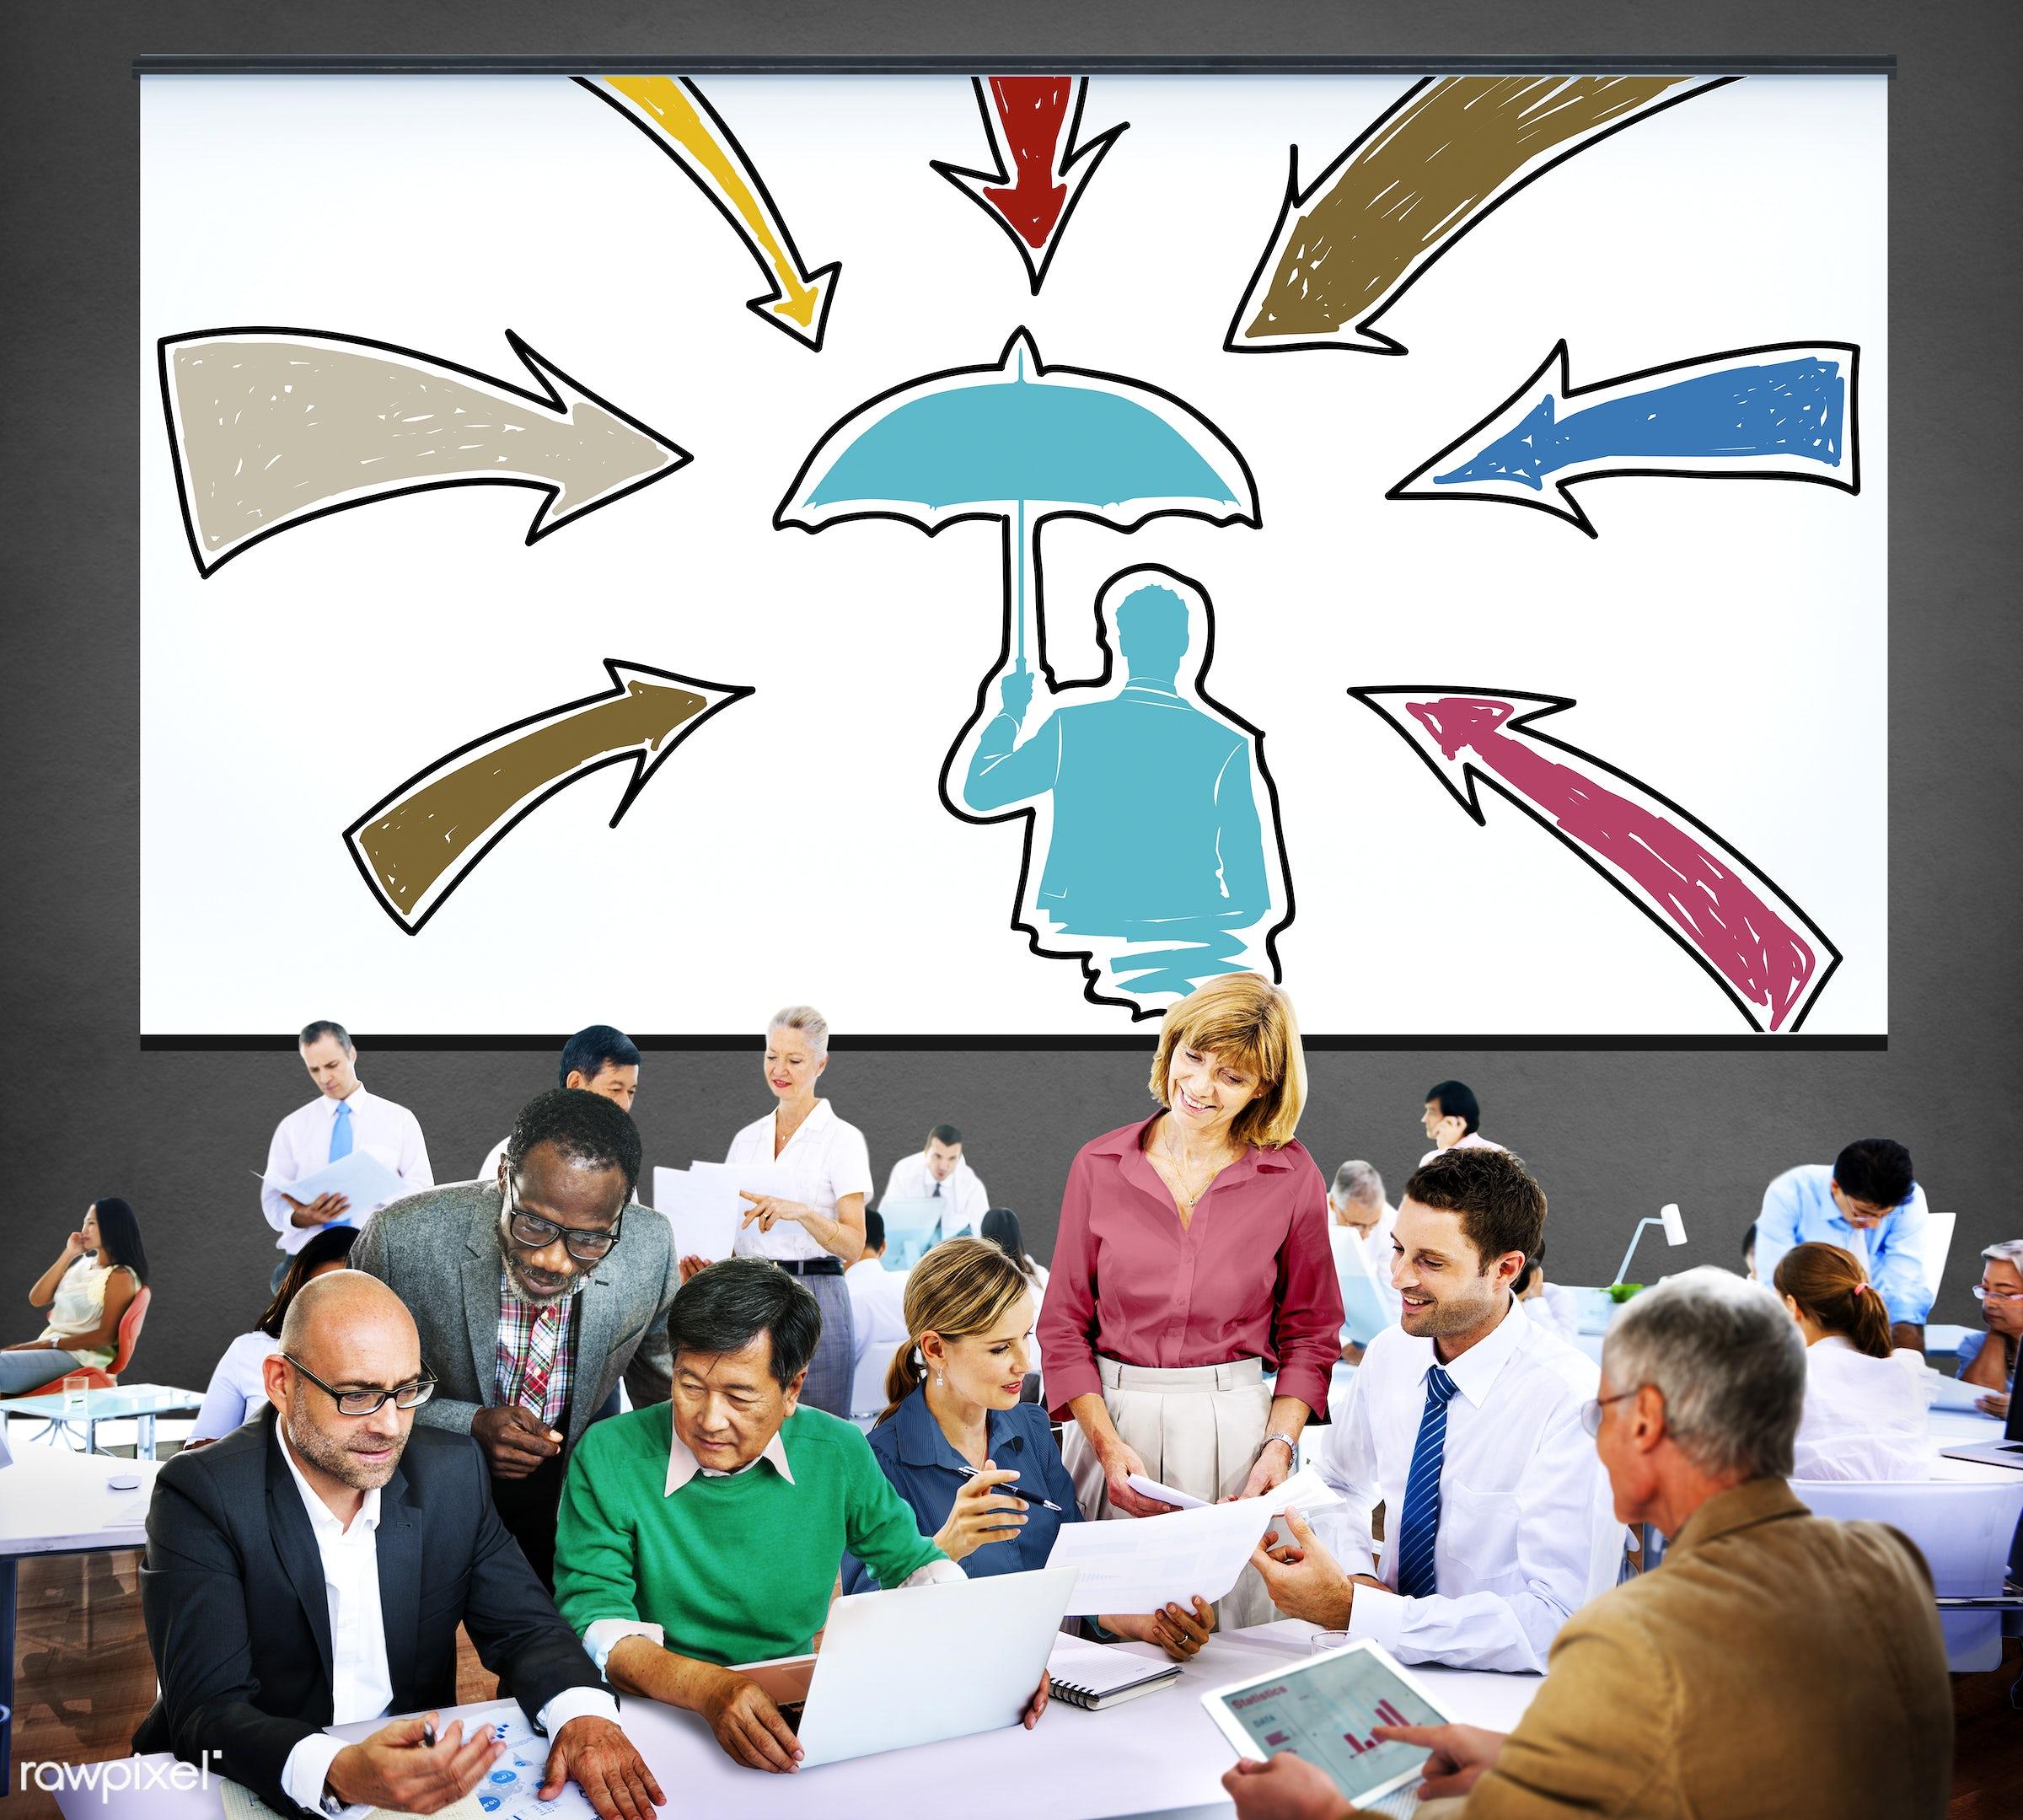 analysis, blackboard, business, business people, businessmen, businesswomen, busy, communication, conversation, corporate,...